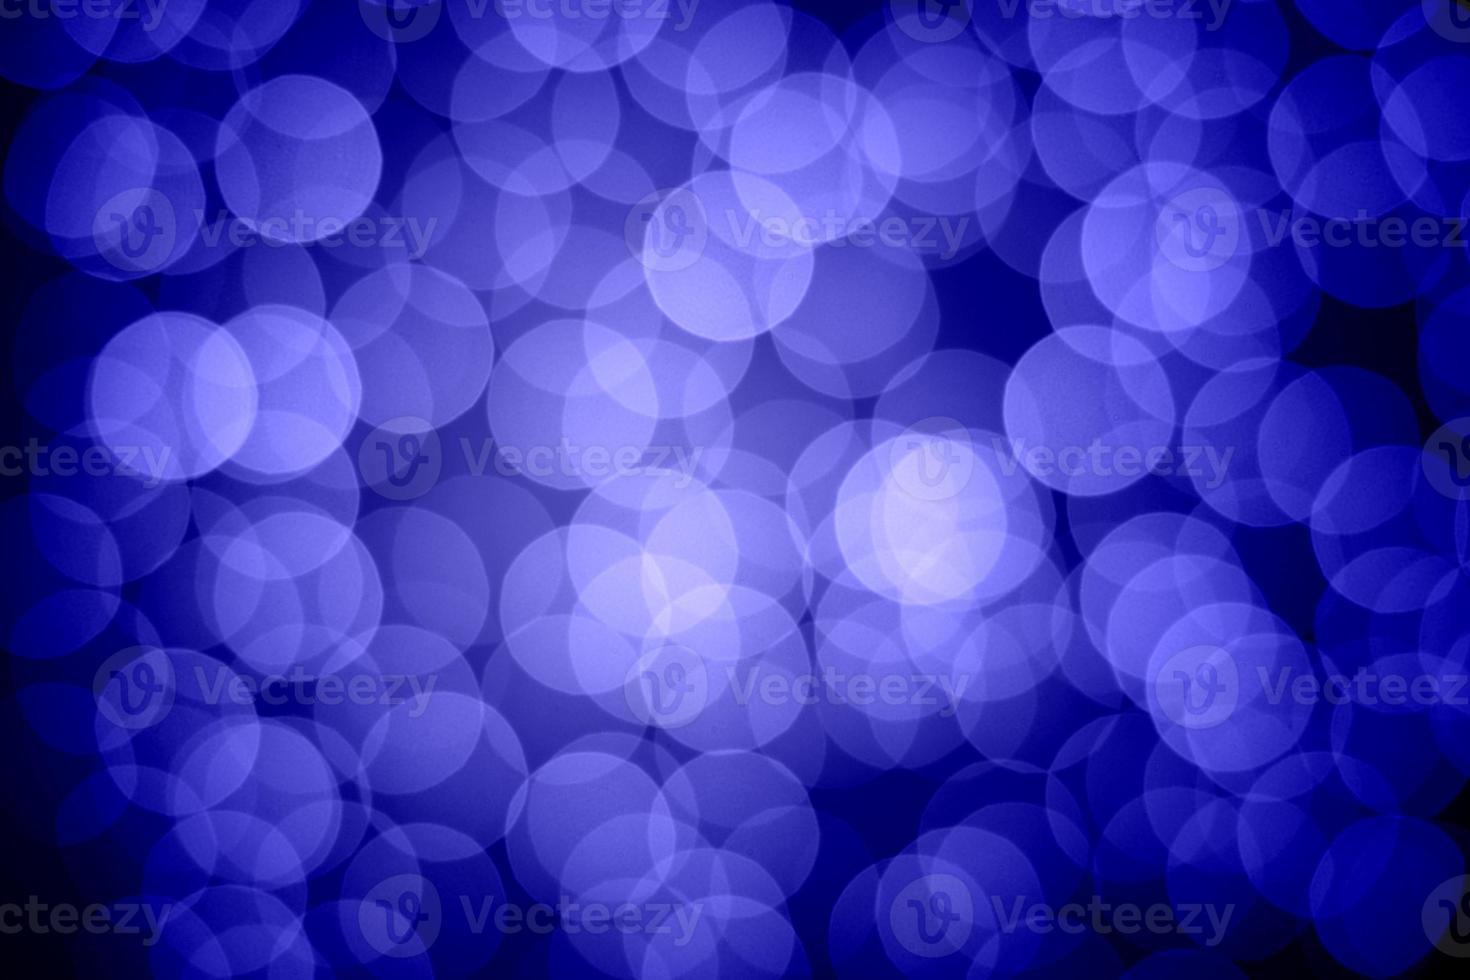 Christmas light - Light defocused photo